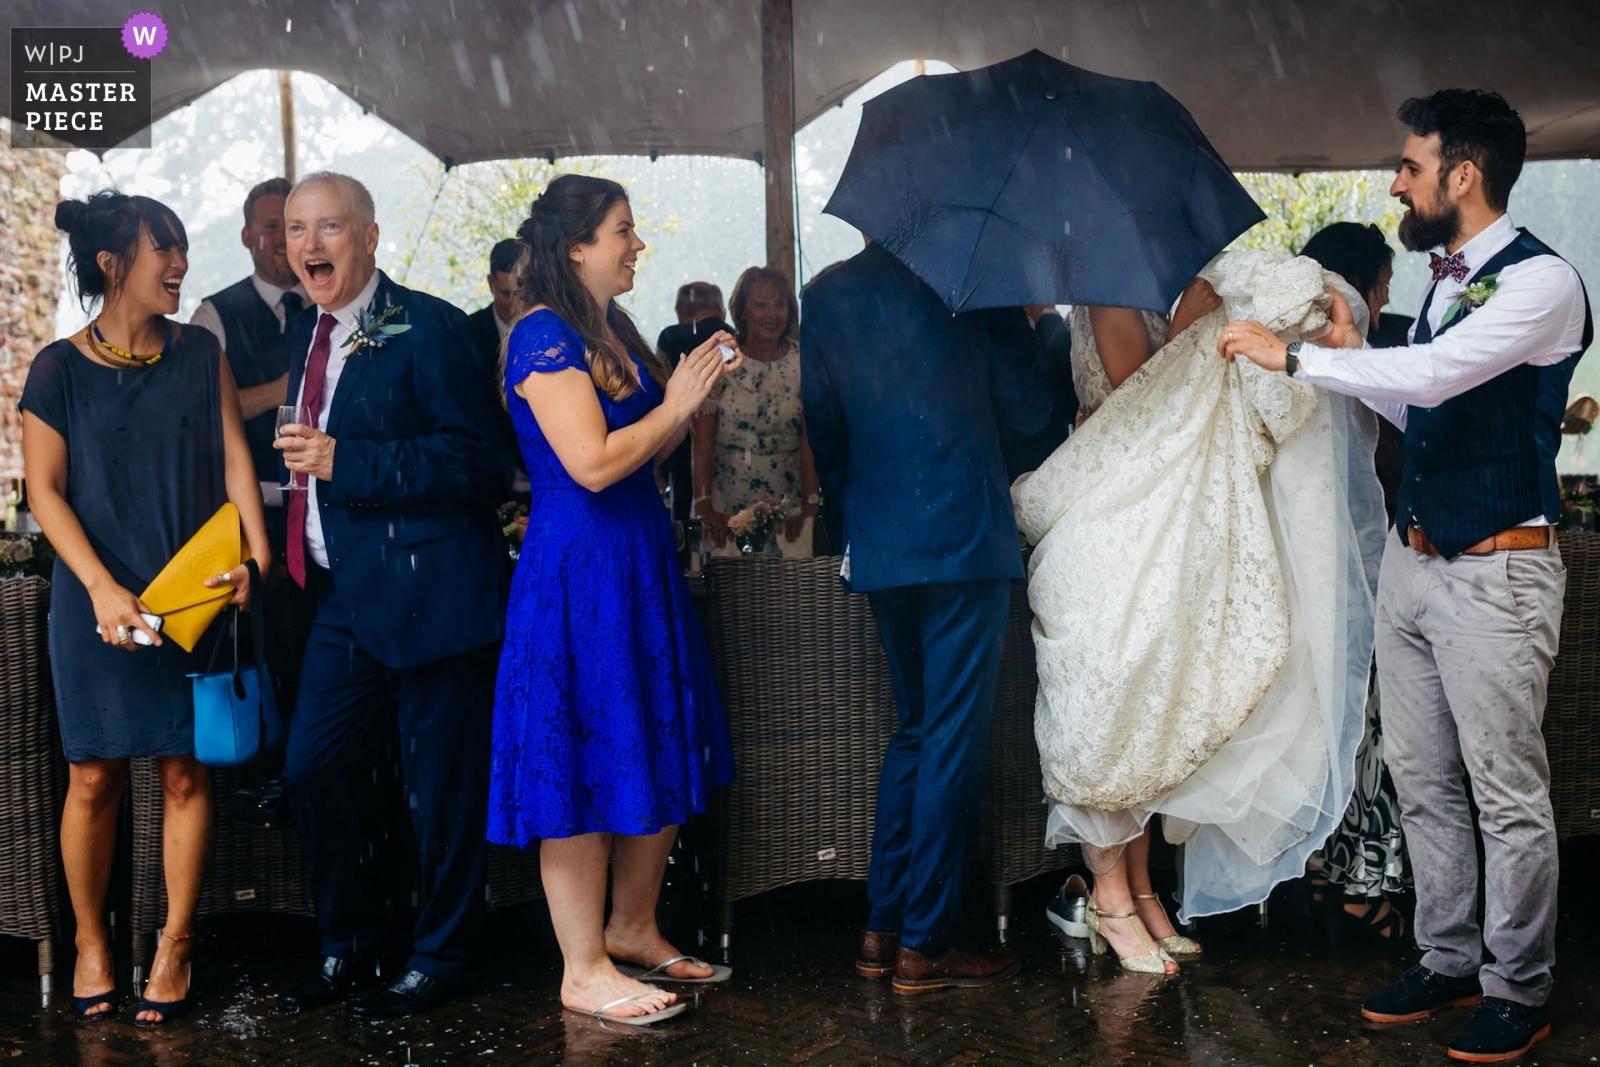 Wedding photo journalists association v9 2019